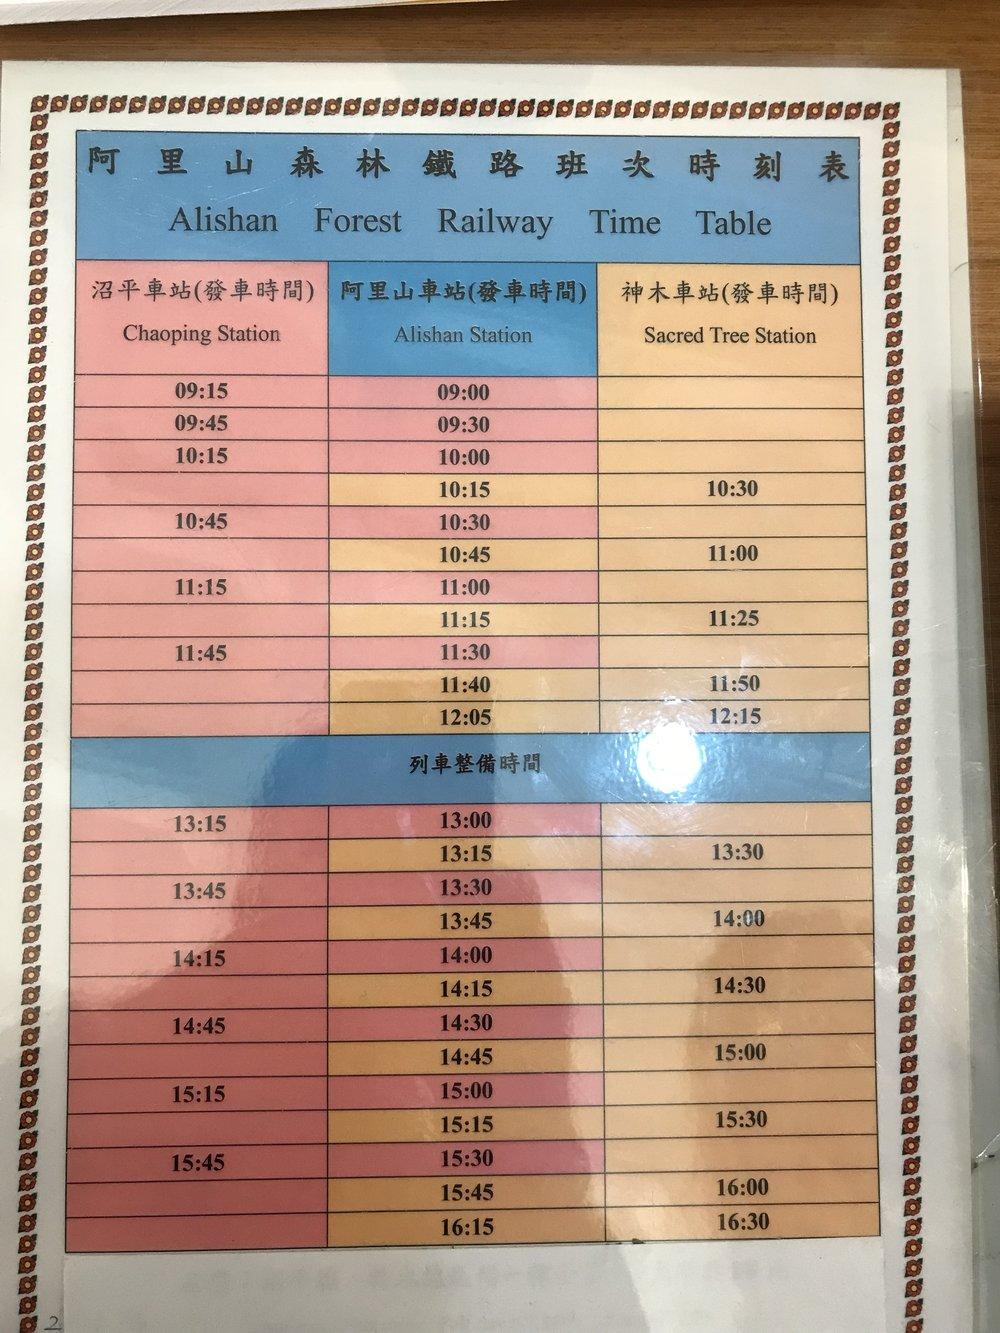 Alishan Train Timetable